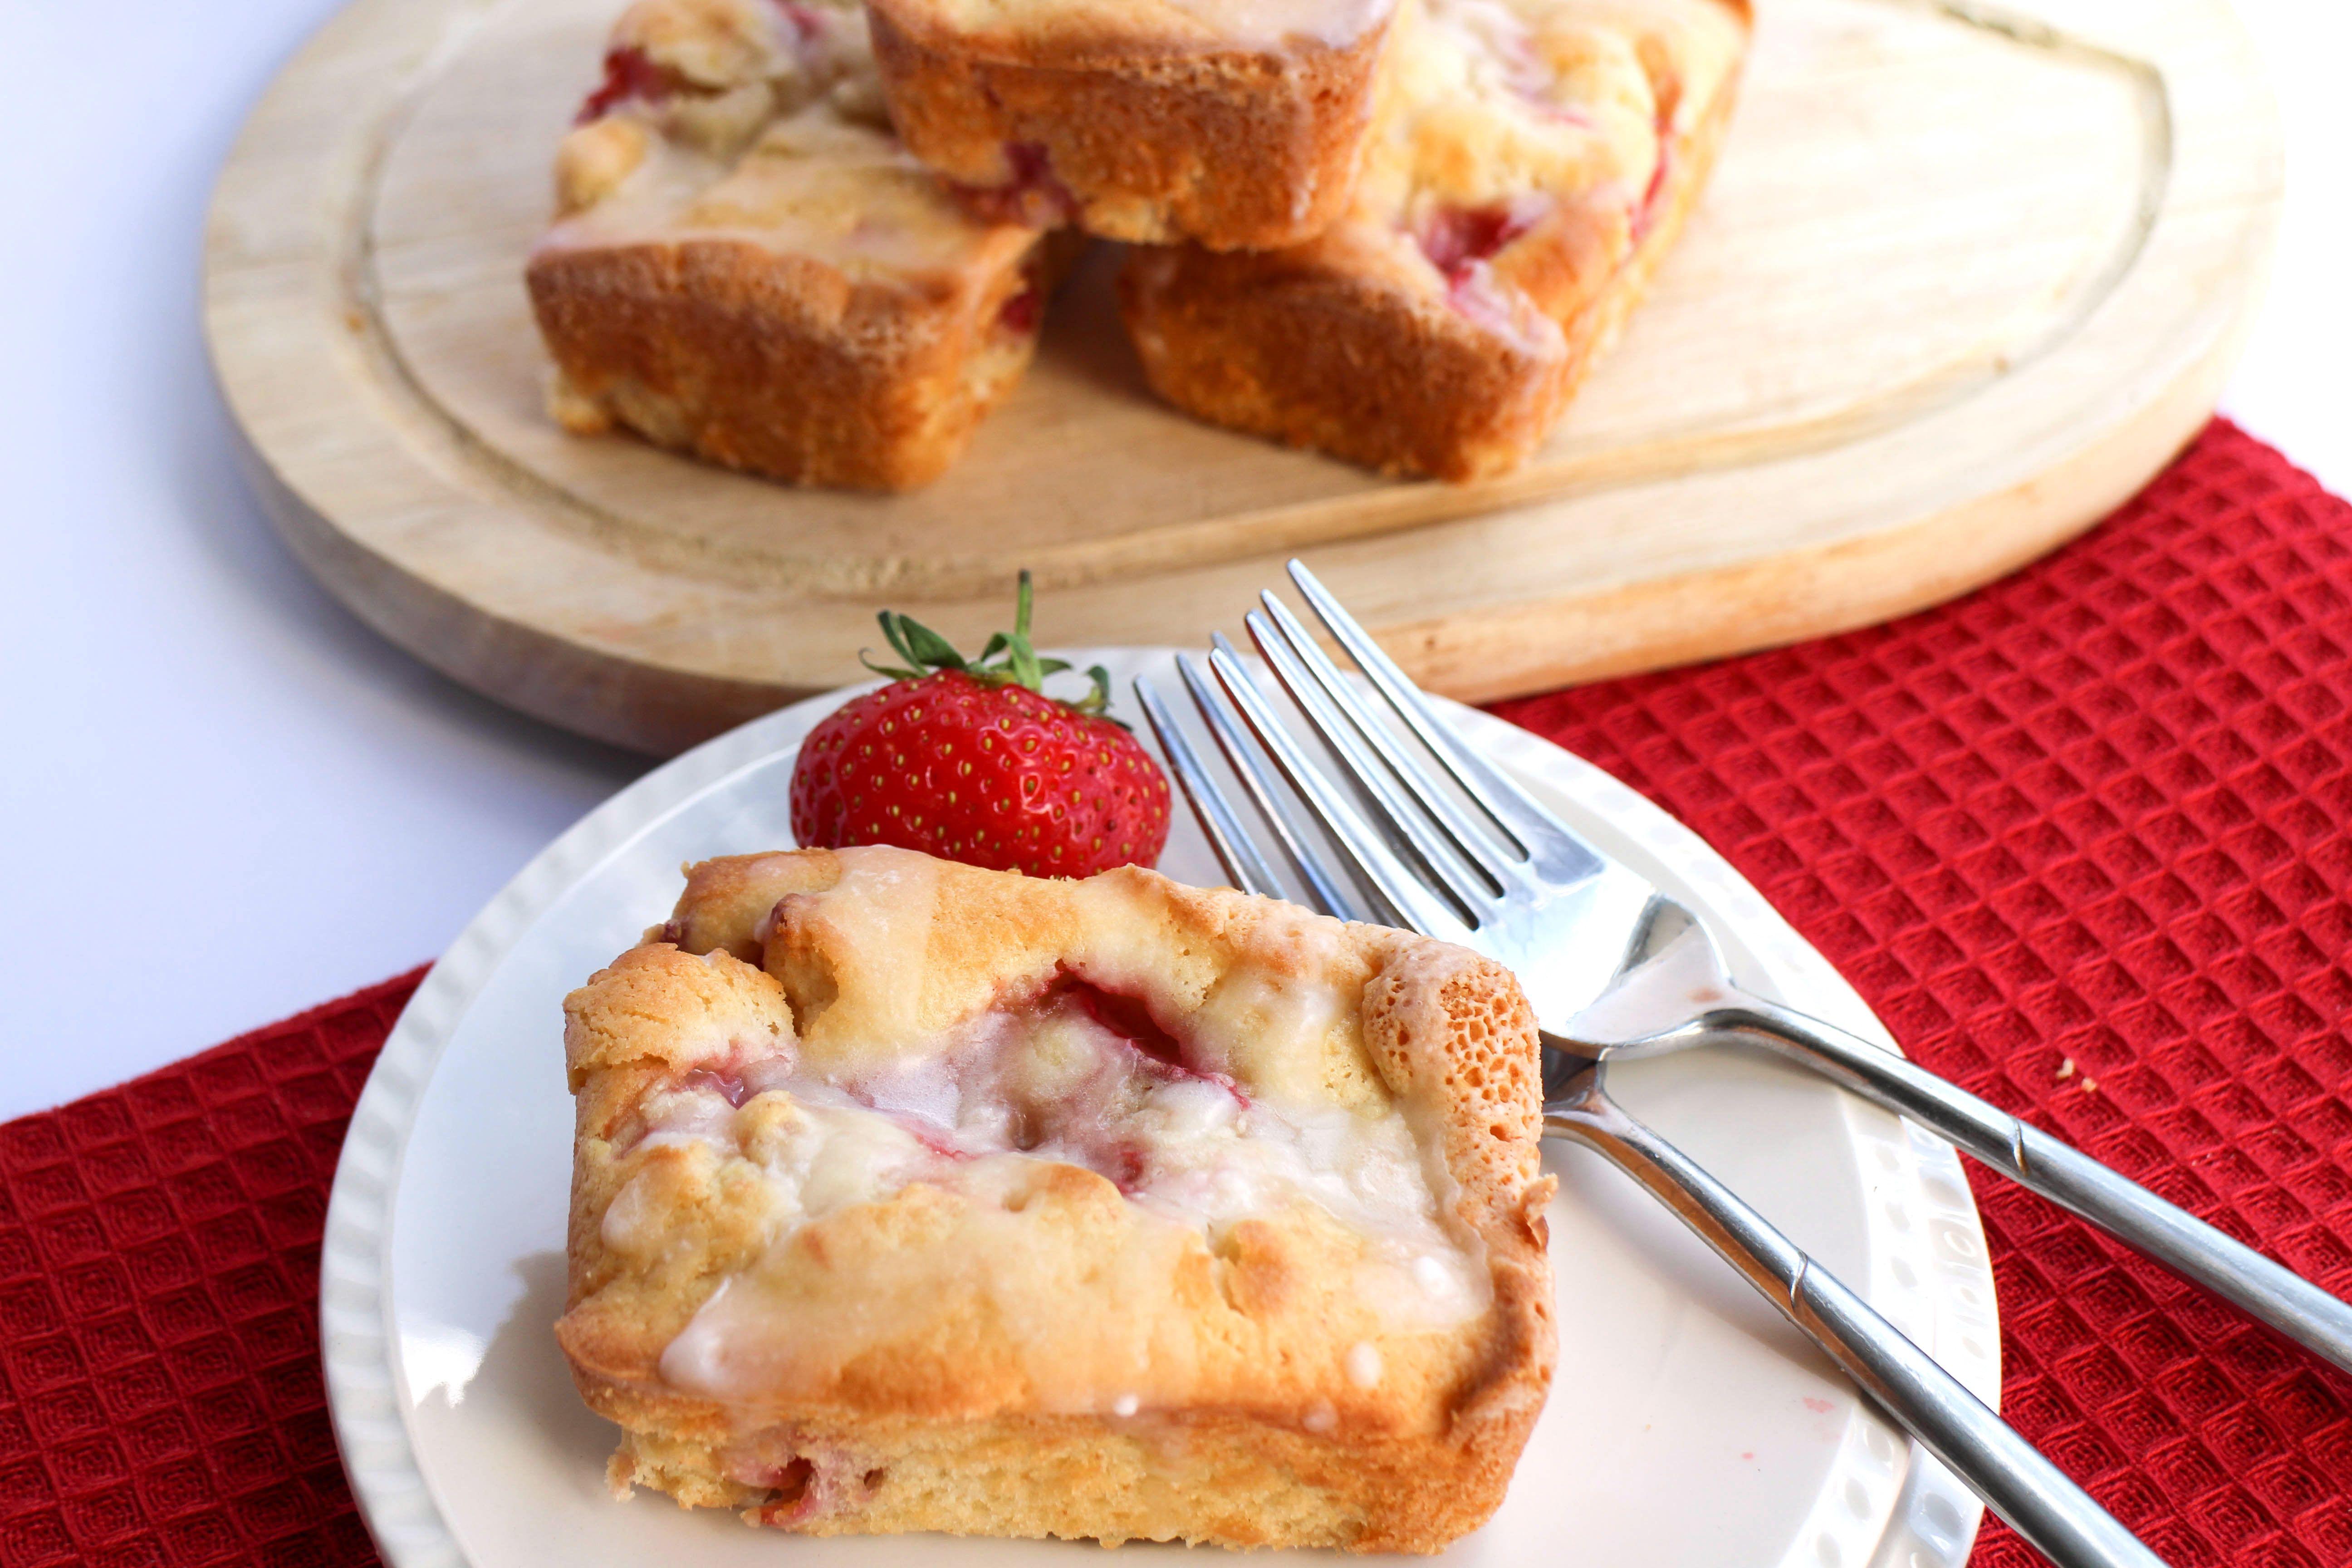 jordbær Støvregn kager